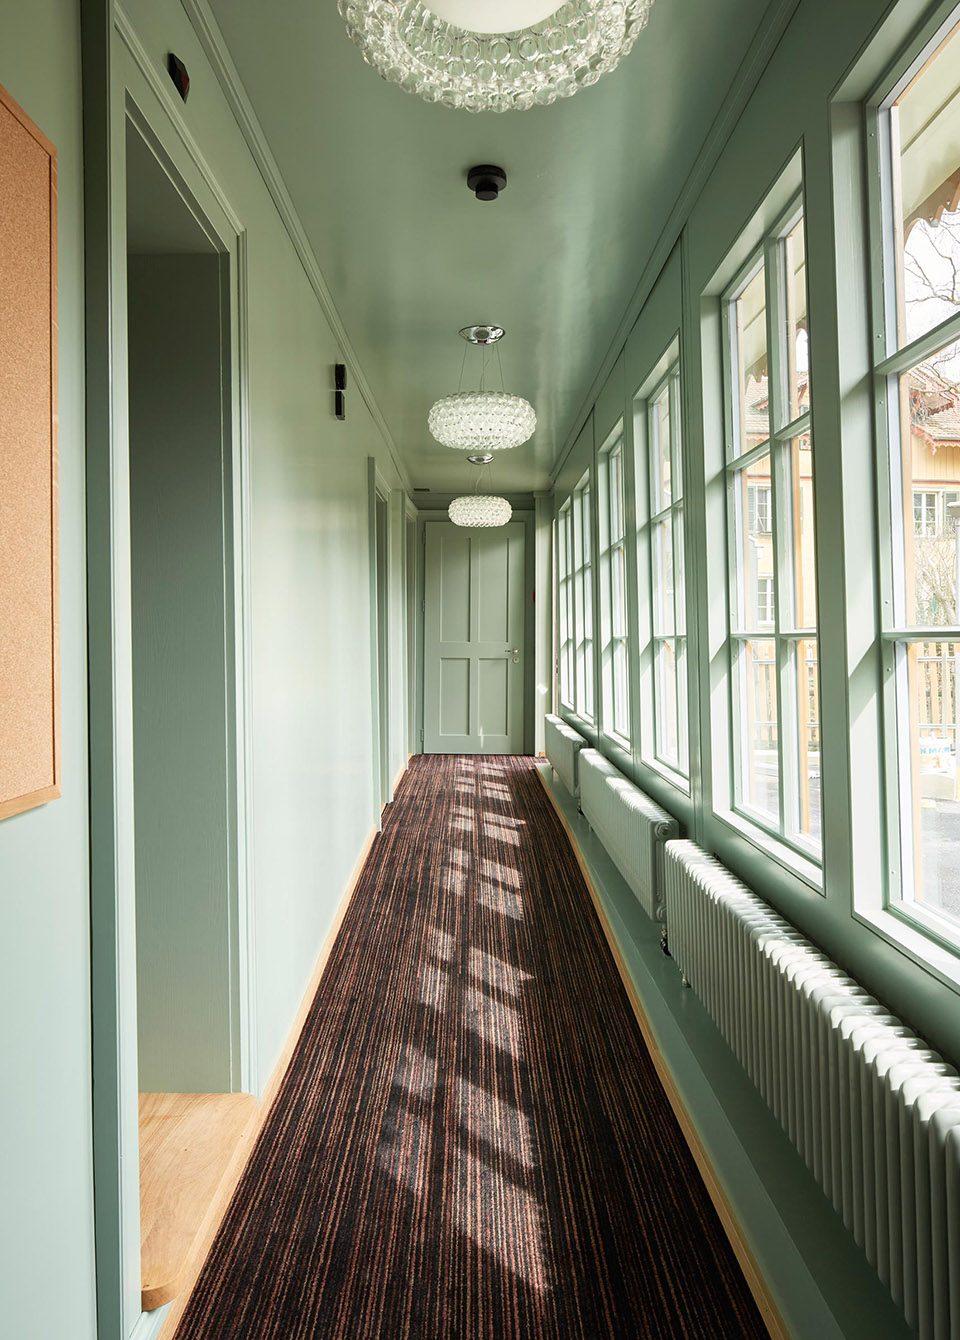 6Sleeping-Beauty-By-Freiluft-Architektur-007-960x1340